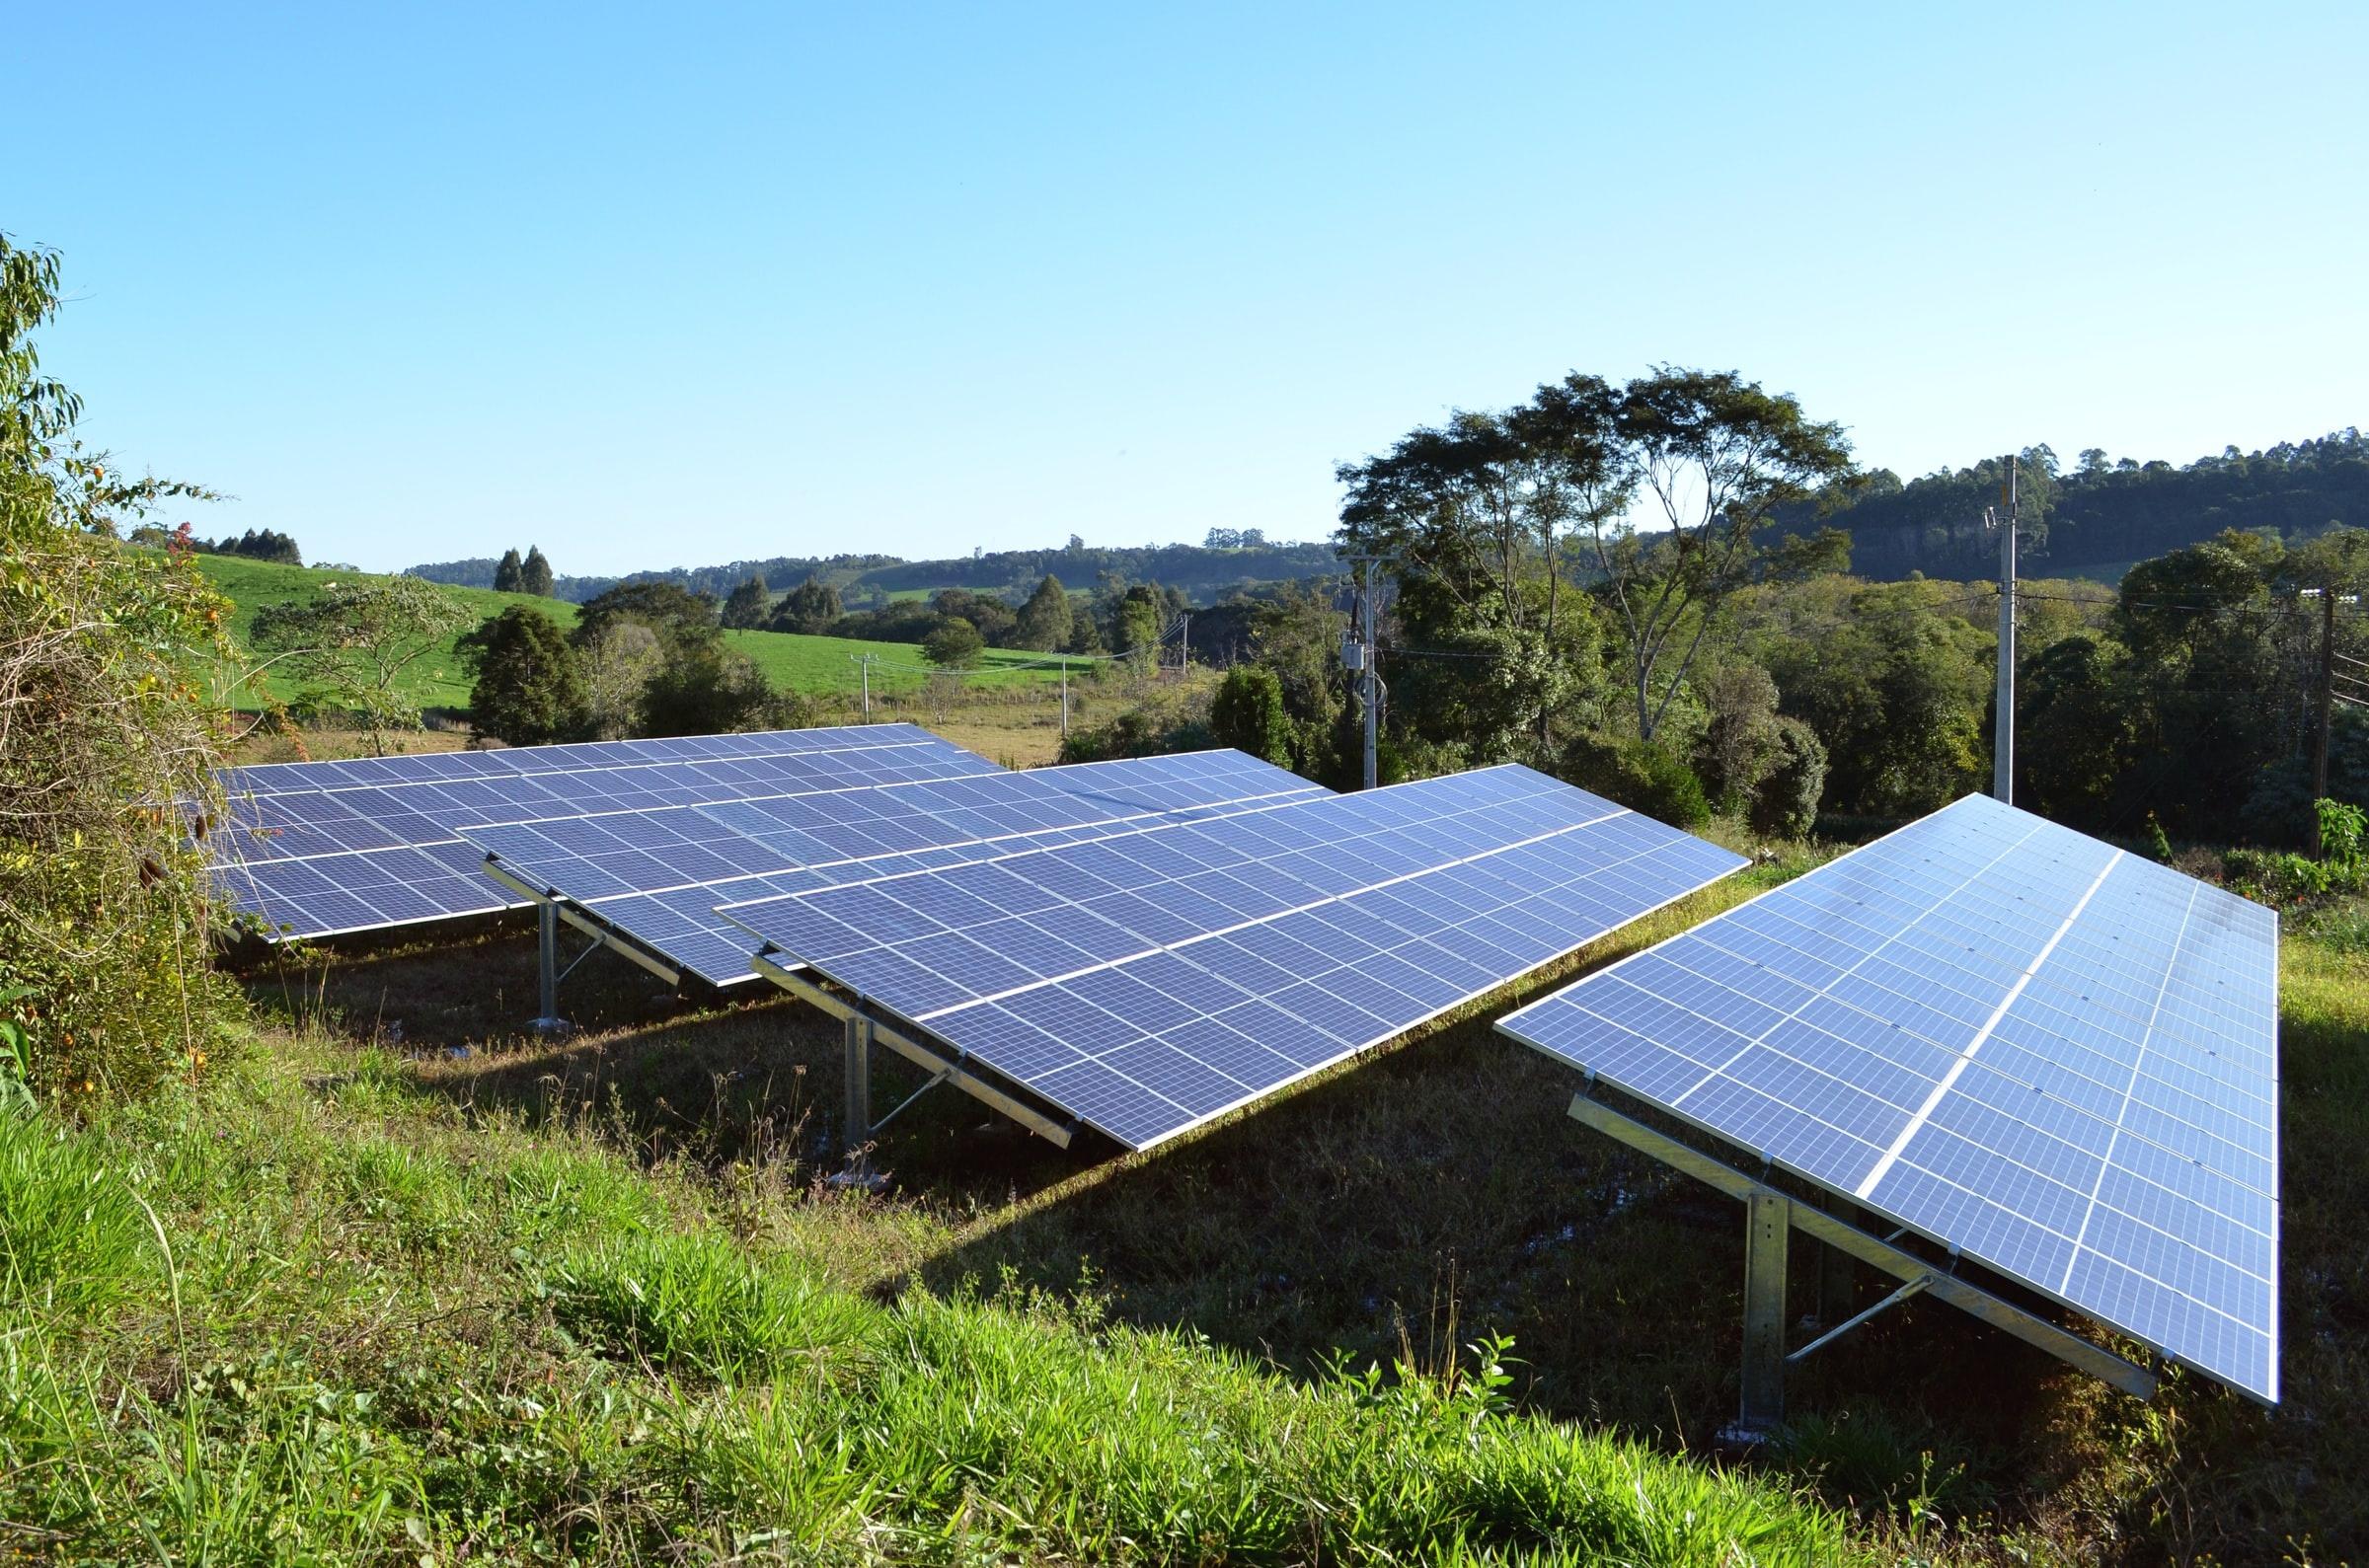 Solar Farms, Solar Land Leasing, Solar Panels, Solar PV, Solar Power, YSG Solar